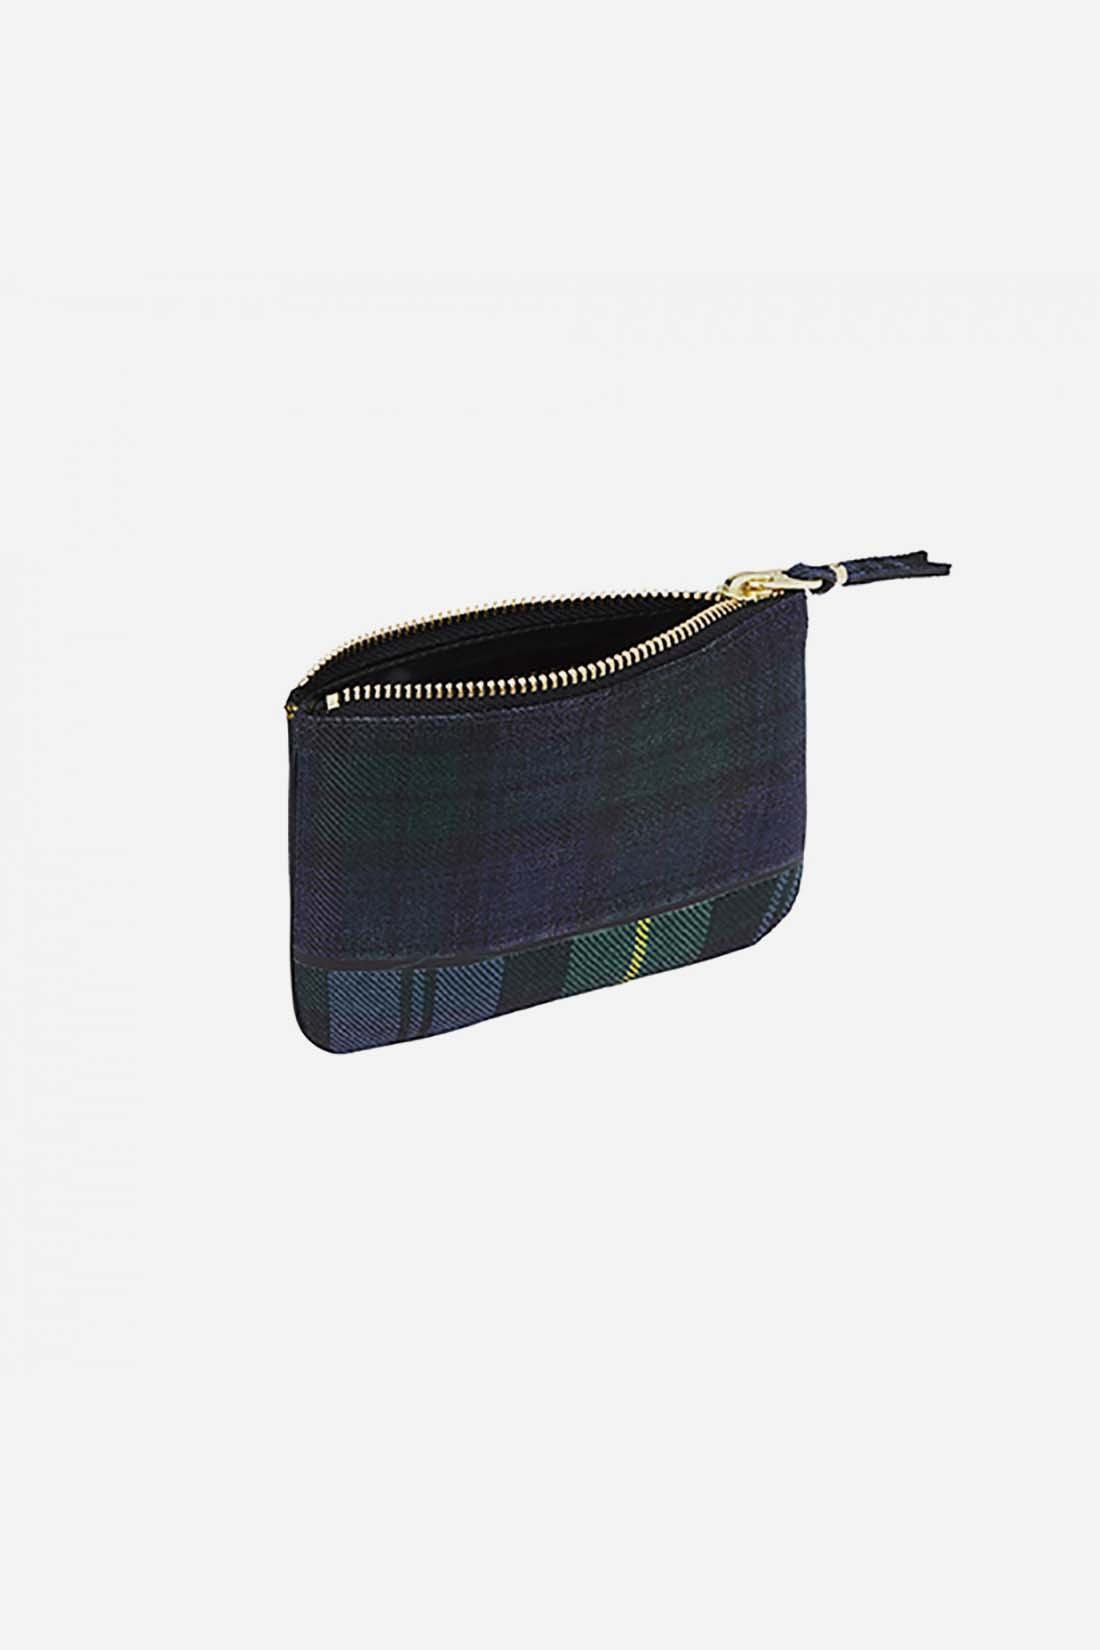 CDG WALLETS FOR WOMAN / Cdg tartan patchwork sa8100tp Green